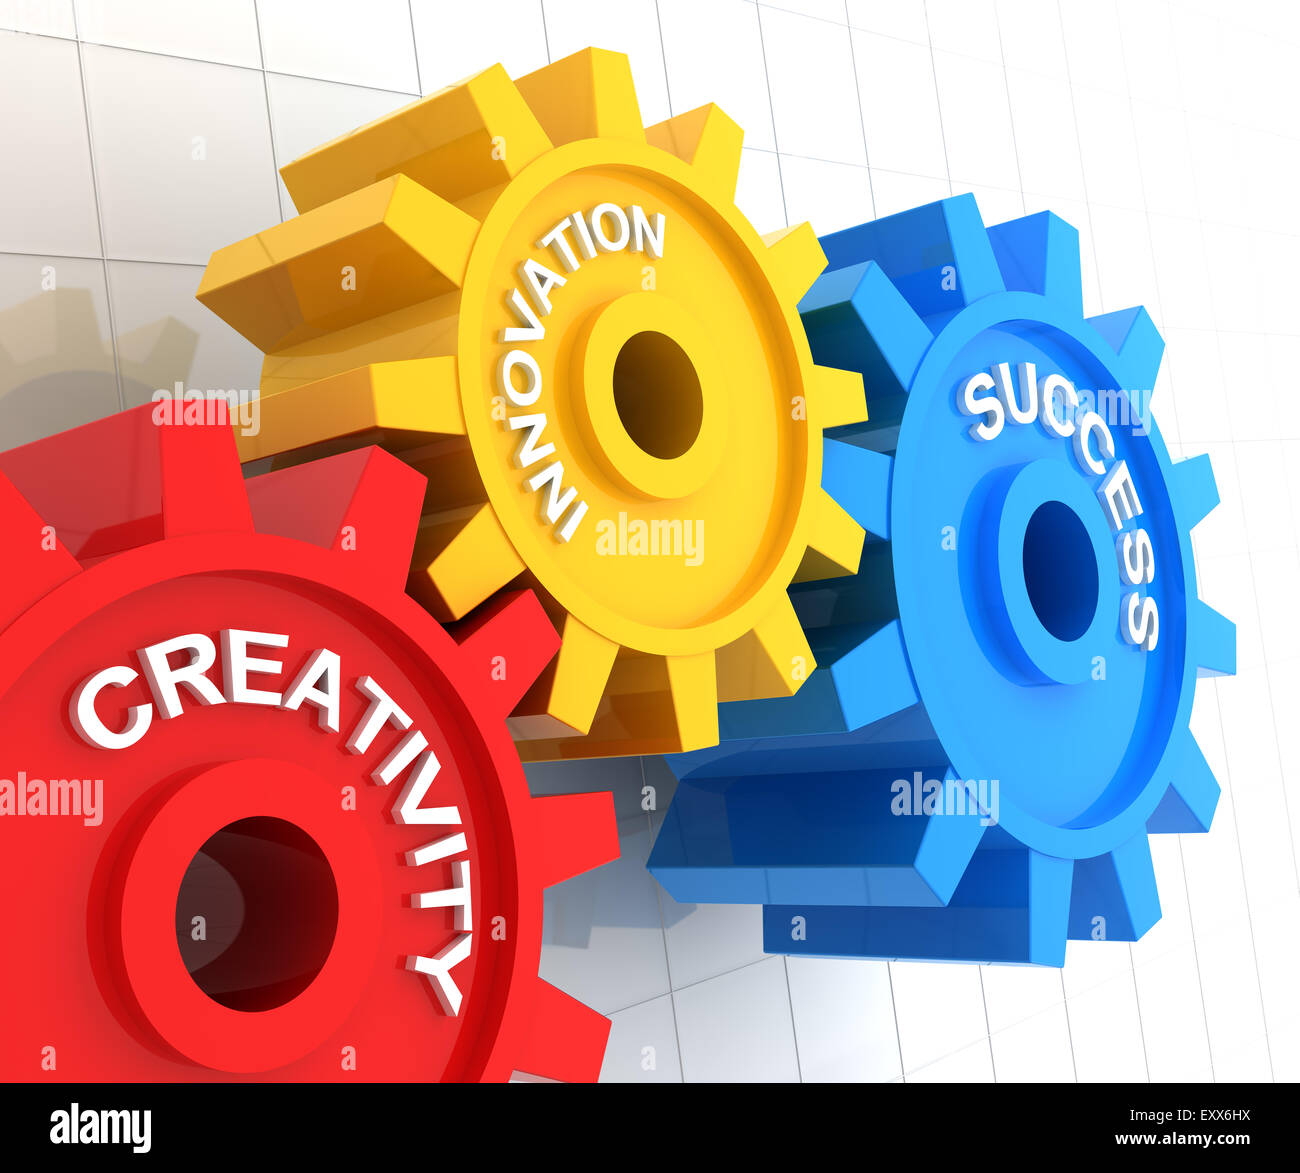 creativity innovation and success stock photo royalty